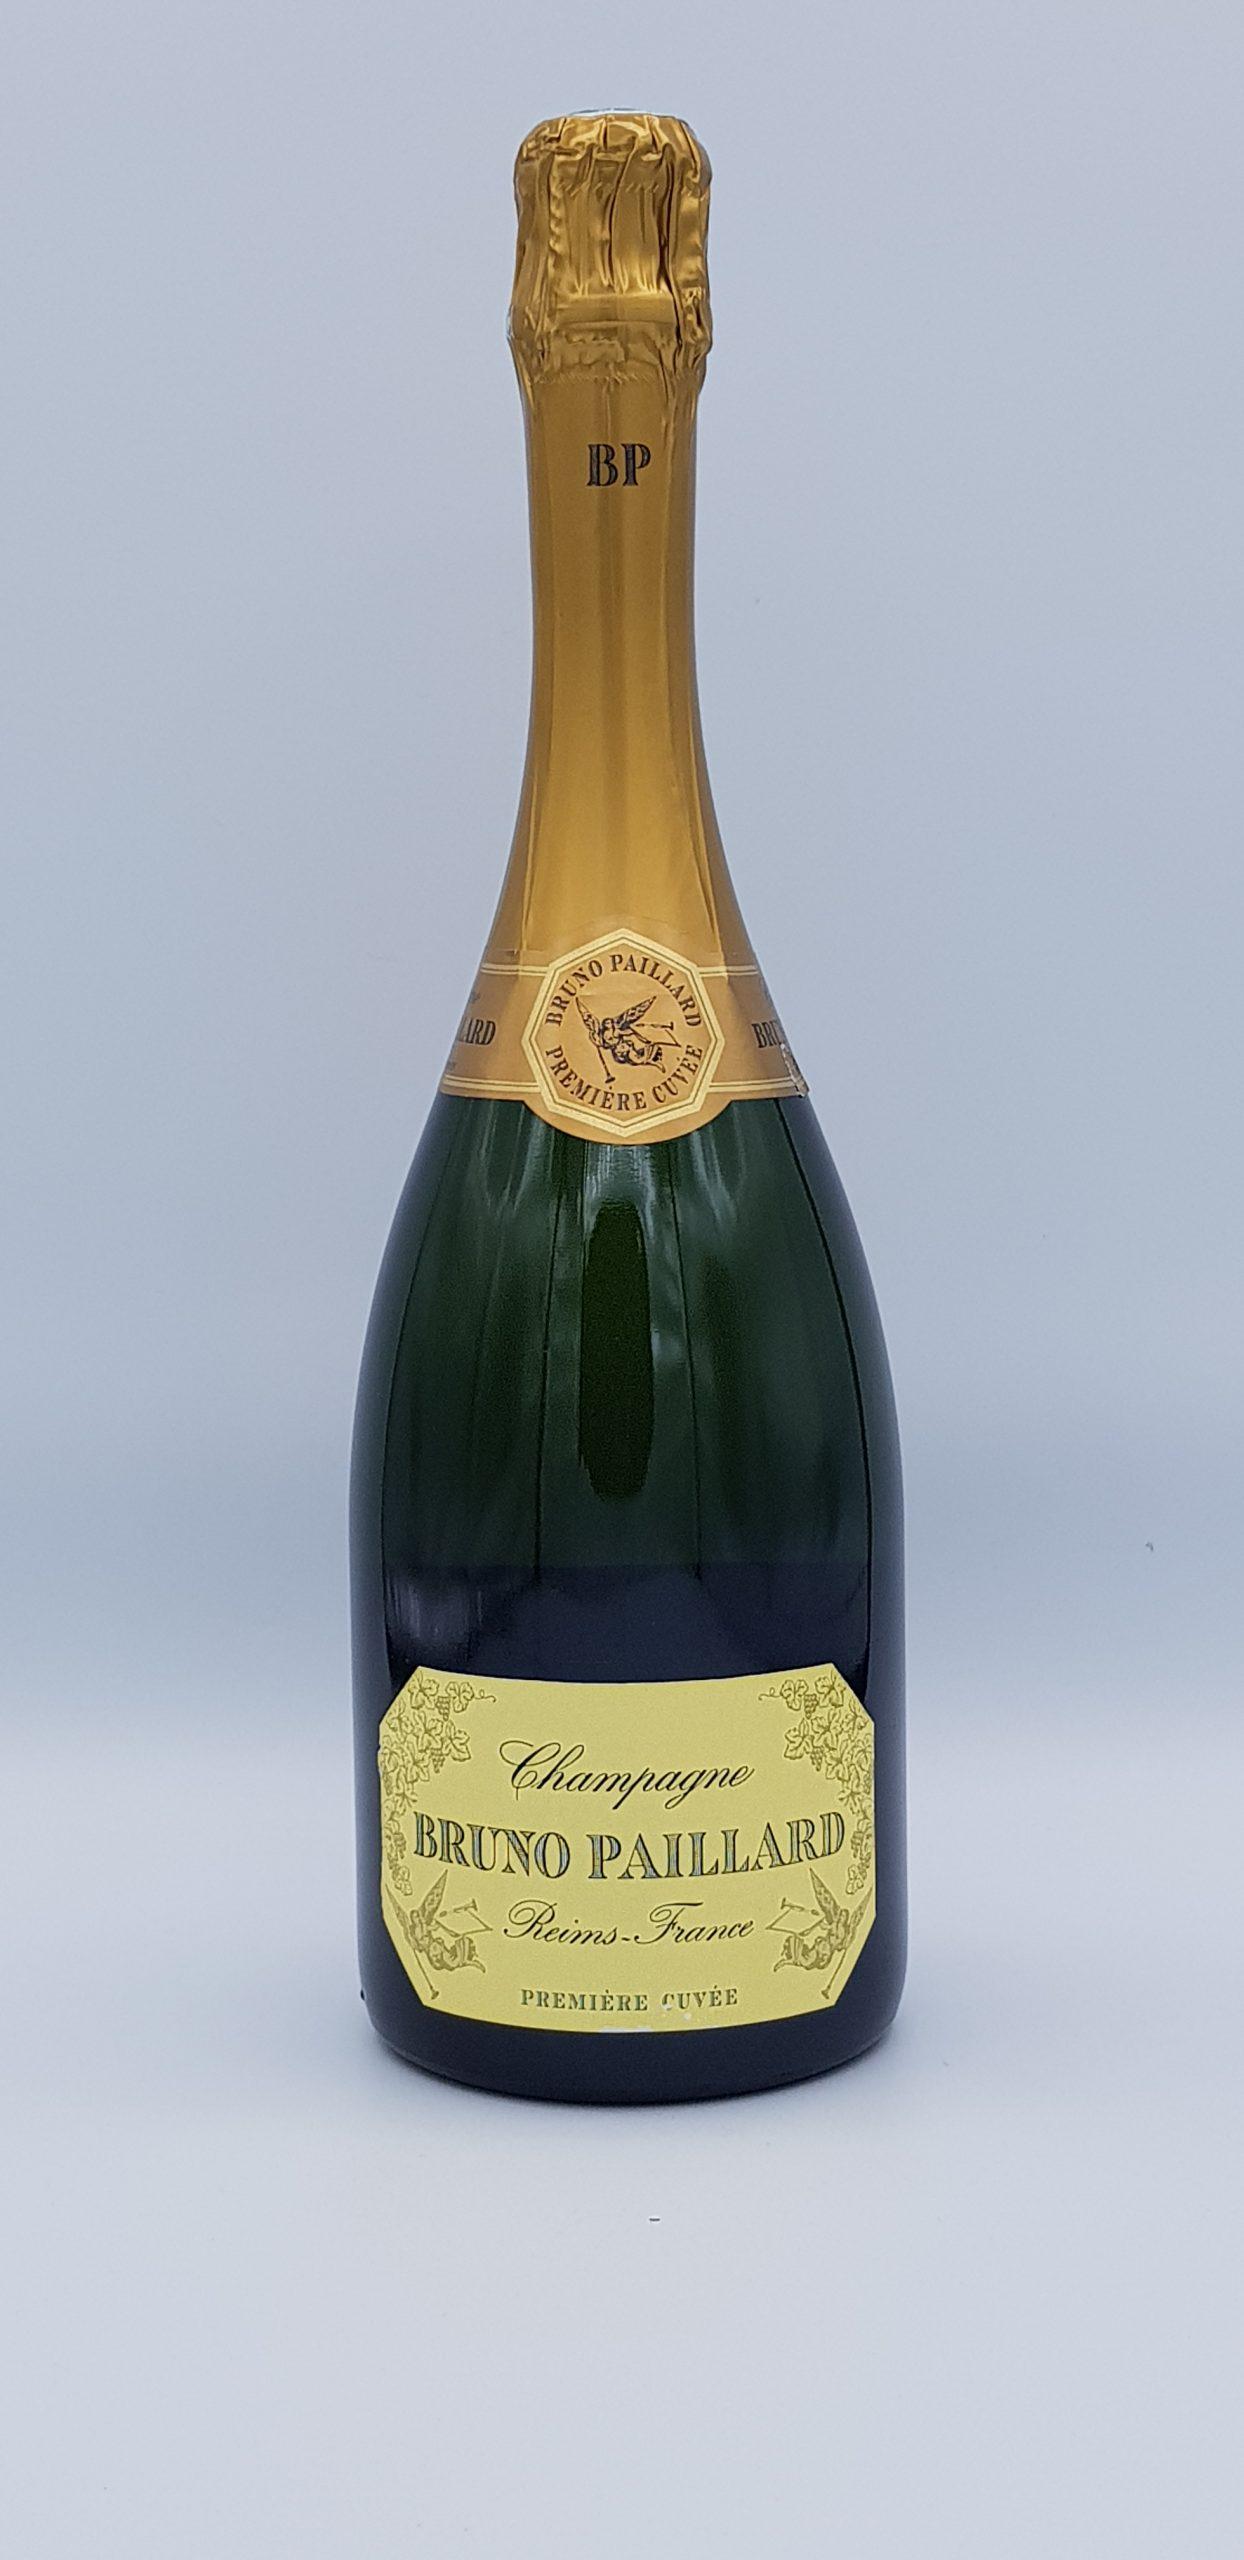 Champagne B Paillard 1Ere Cuvee